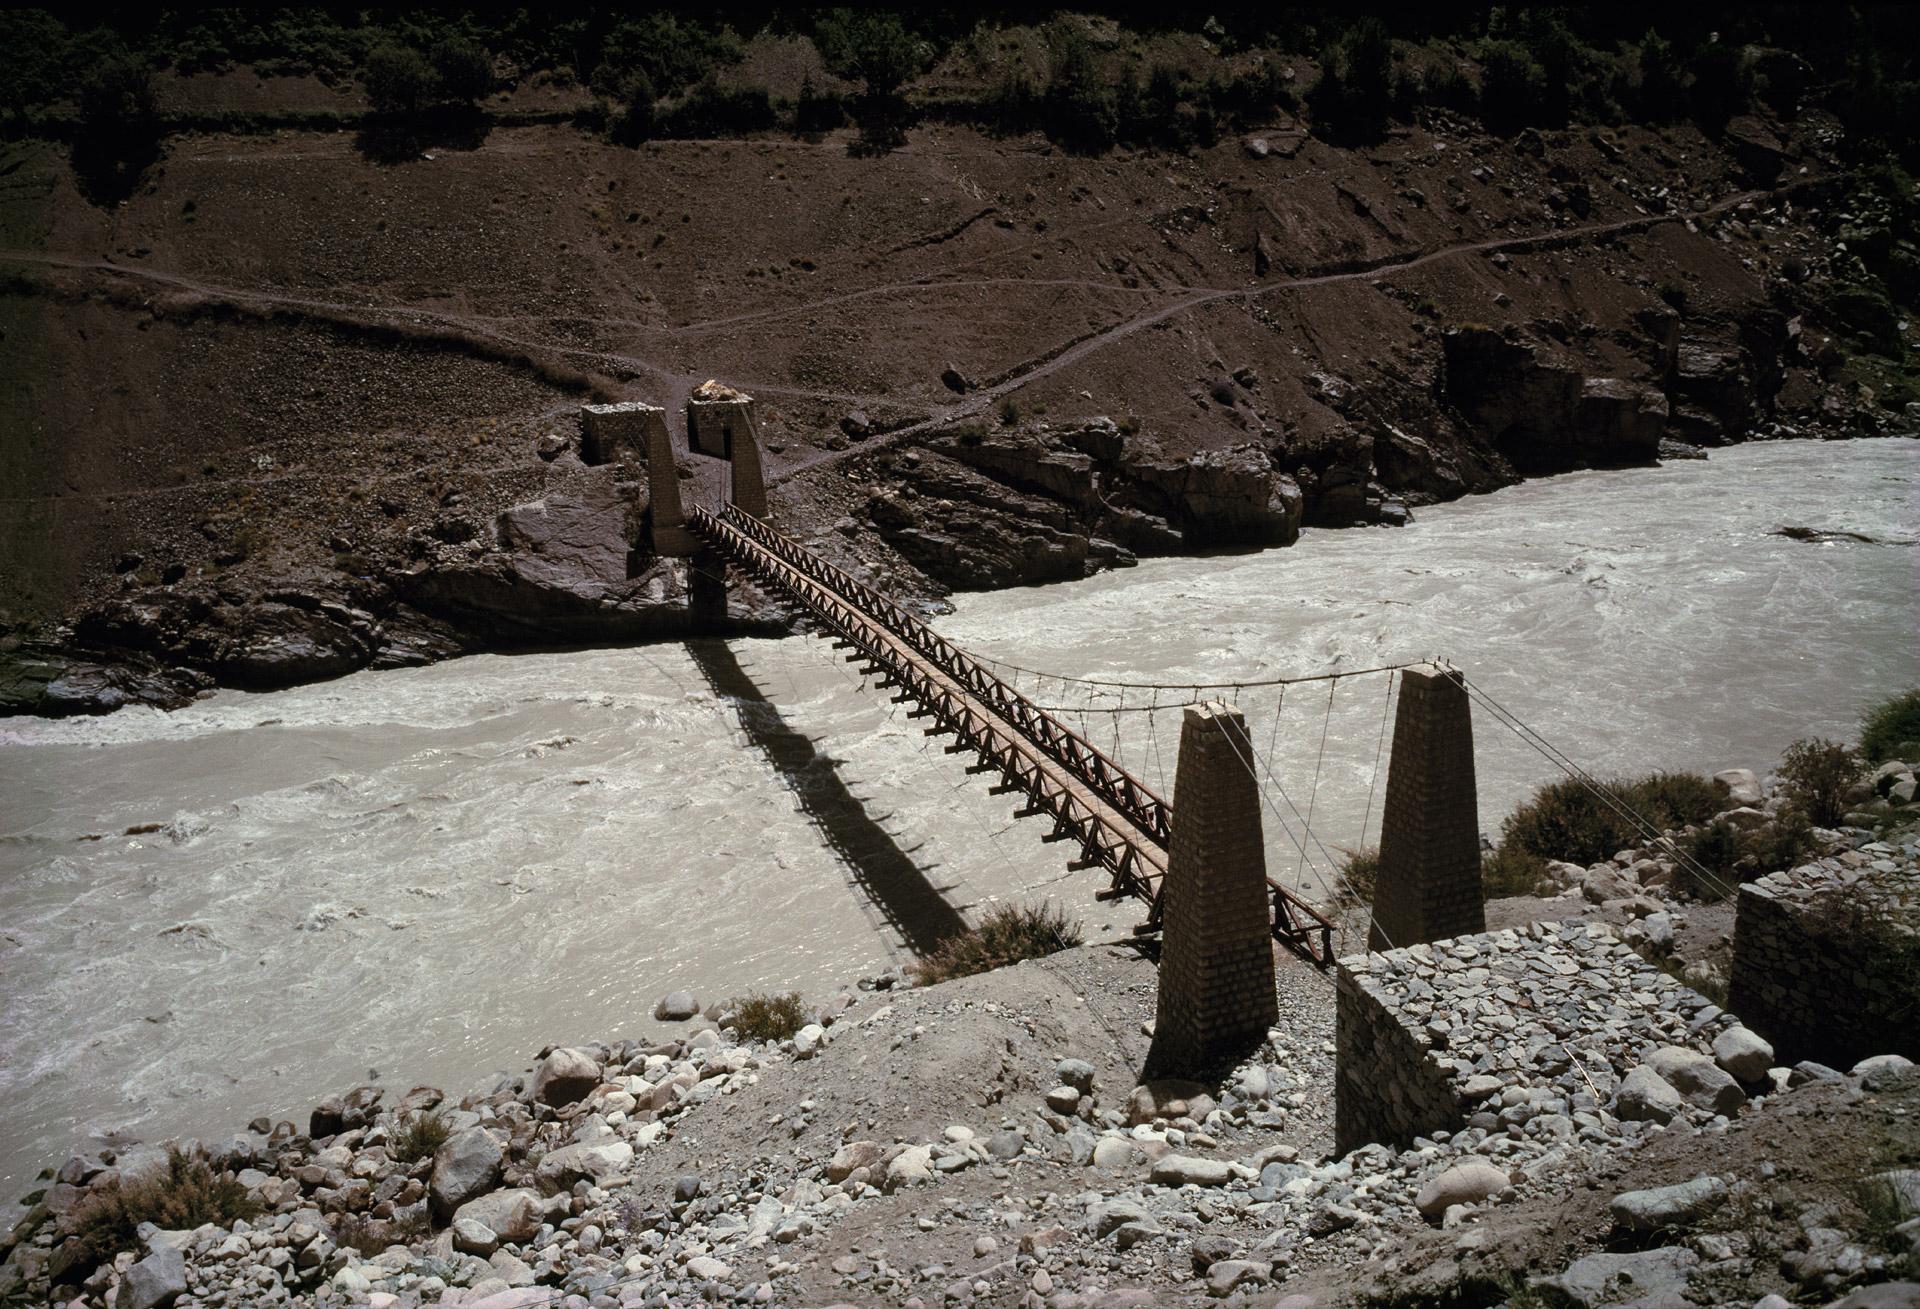 A bridge across a river in Ladakh, India